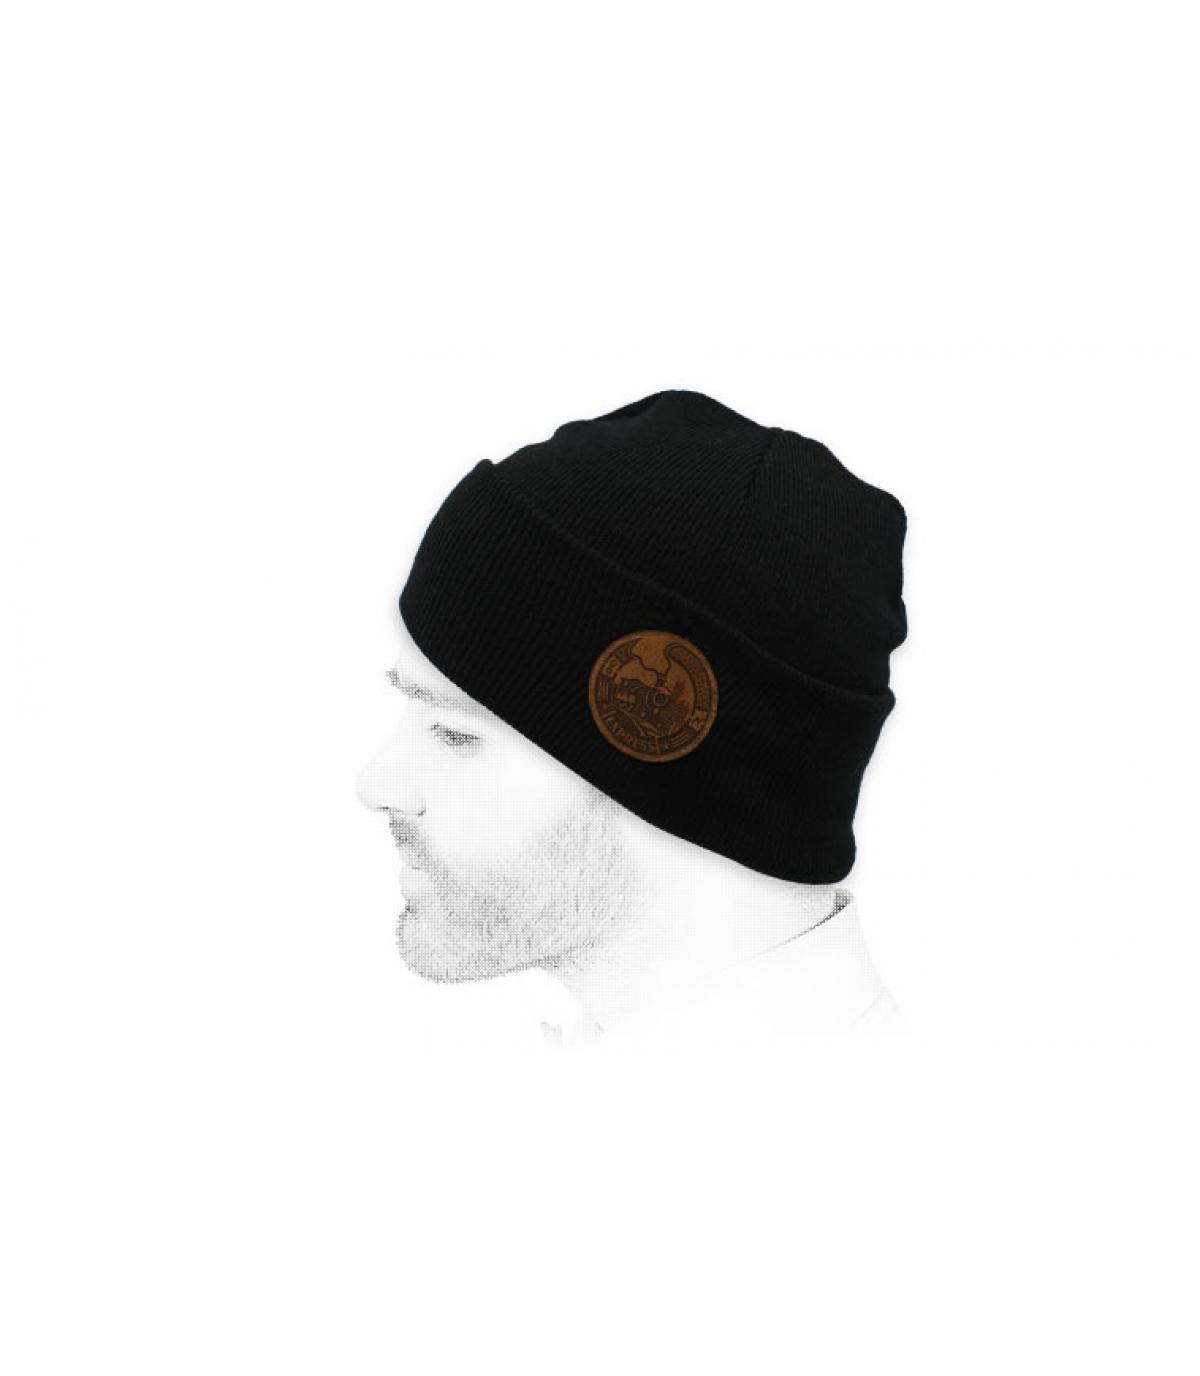 Mütze Express Zug schwarz